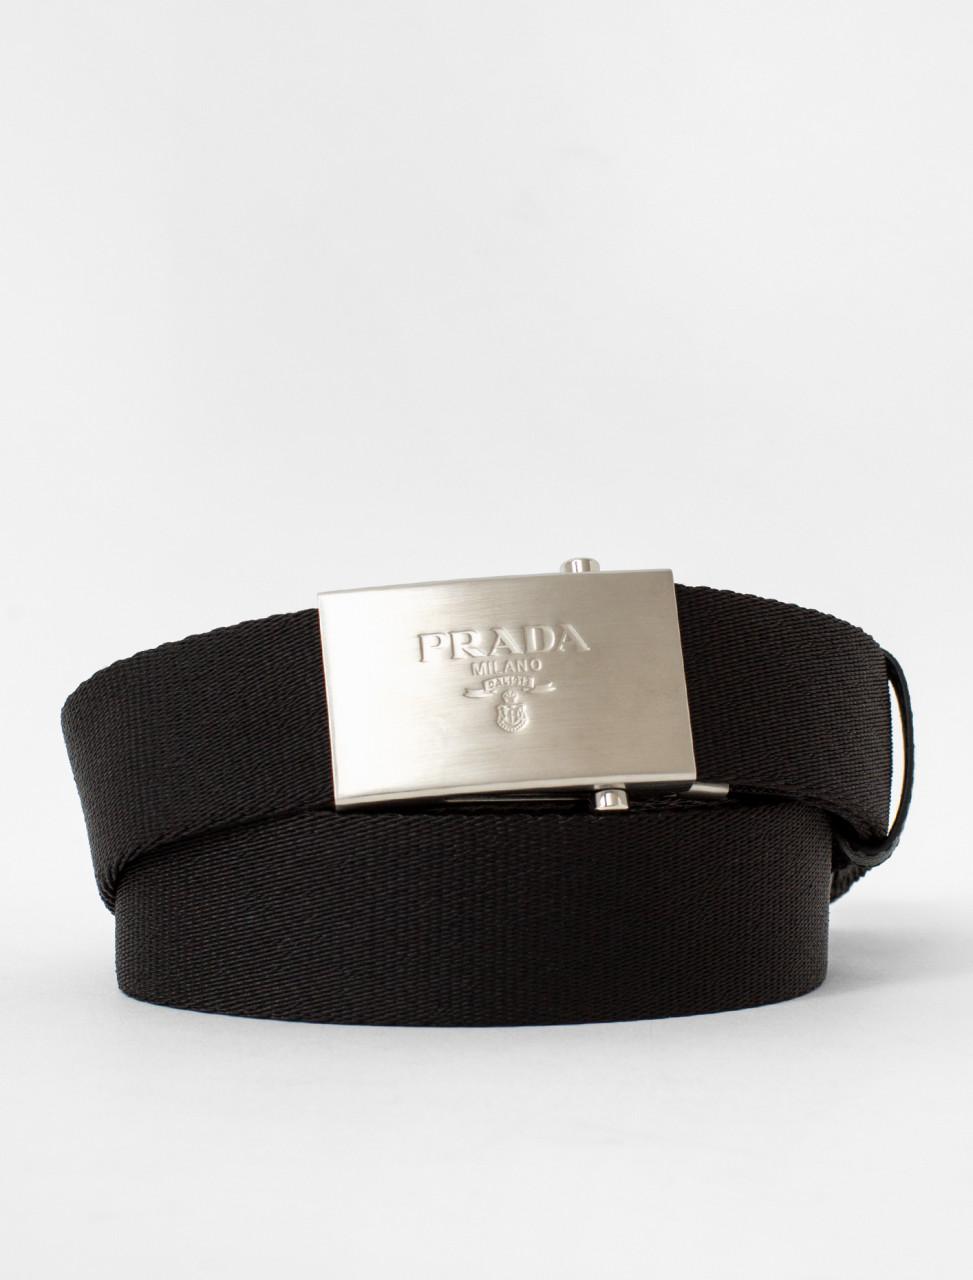 Prada Woven Fabric Belt